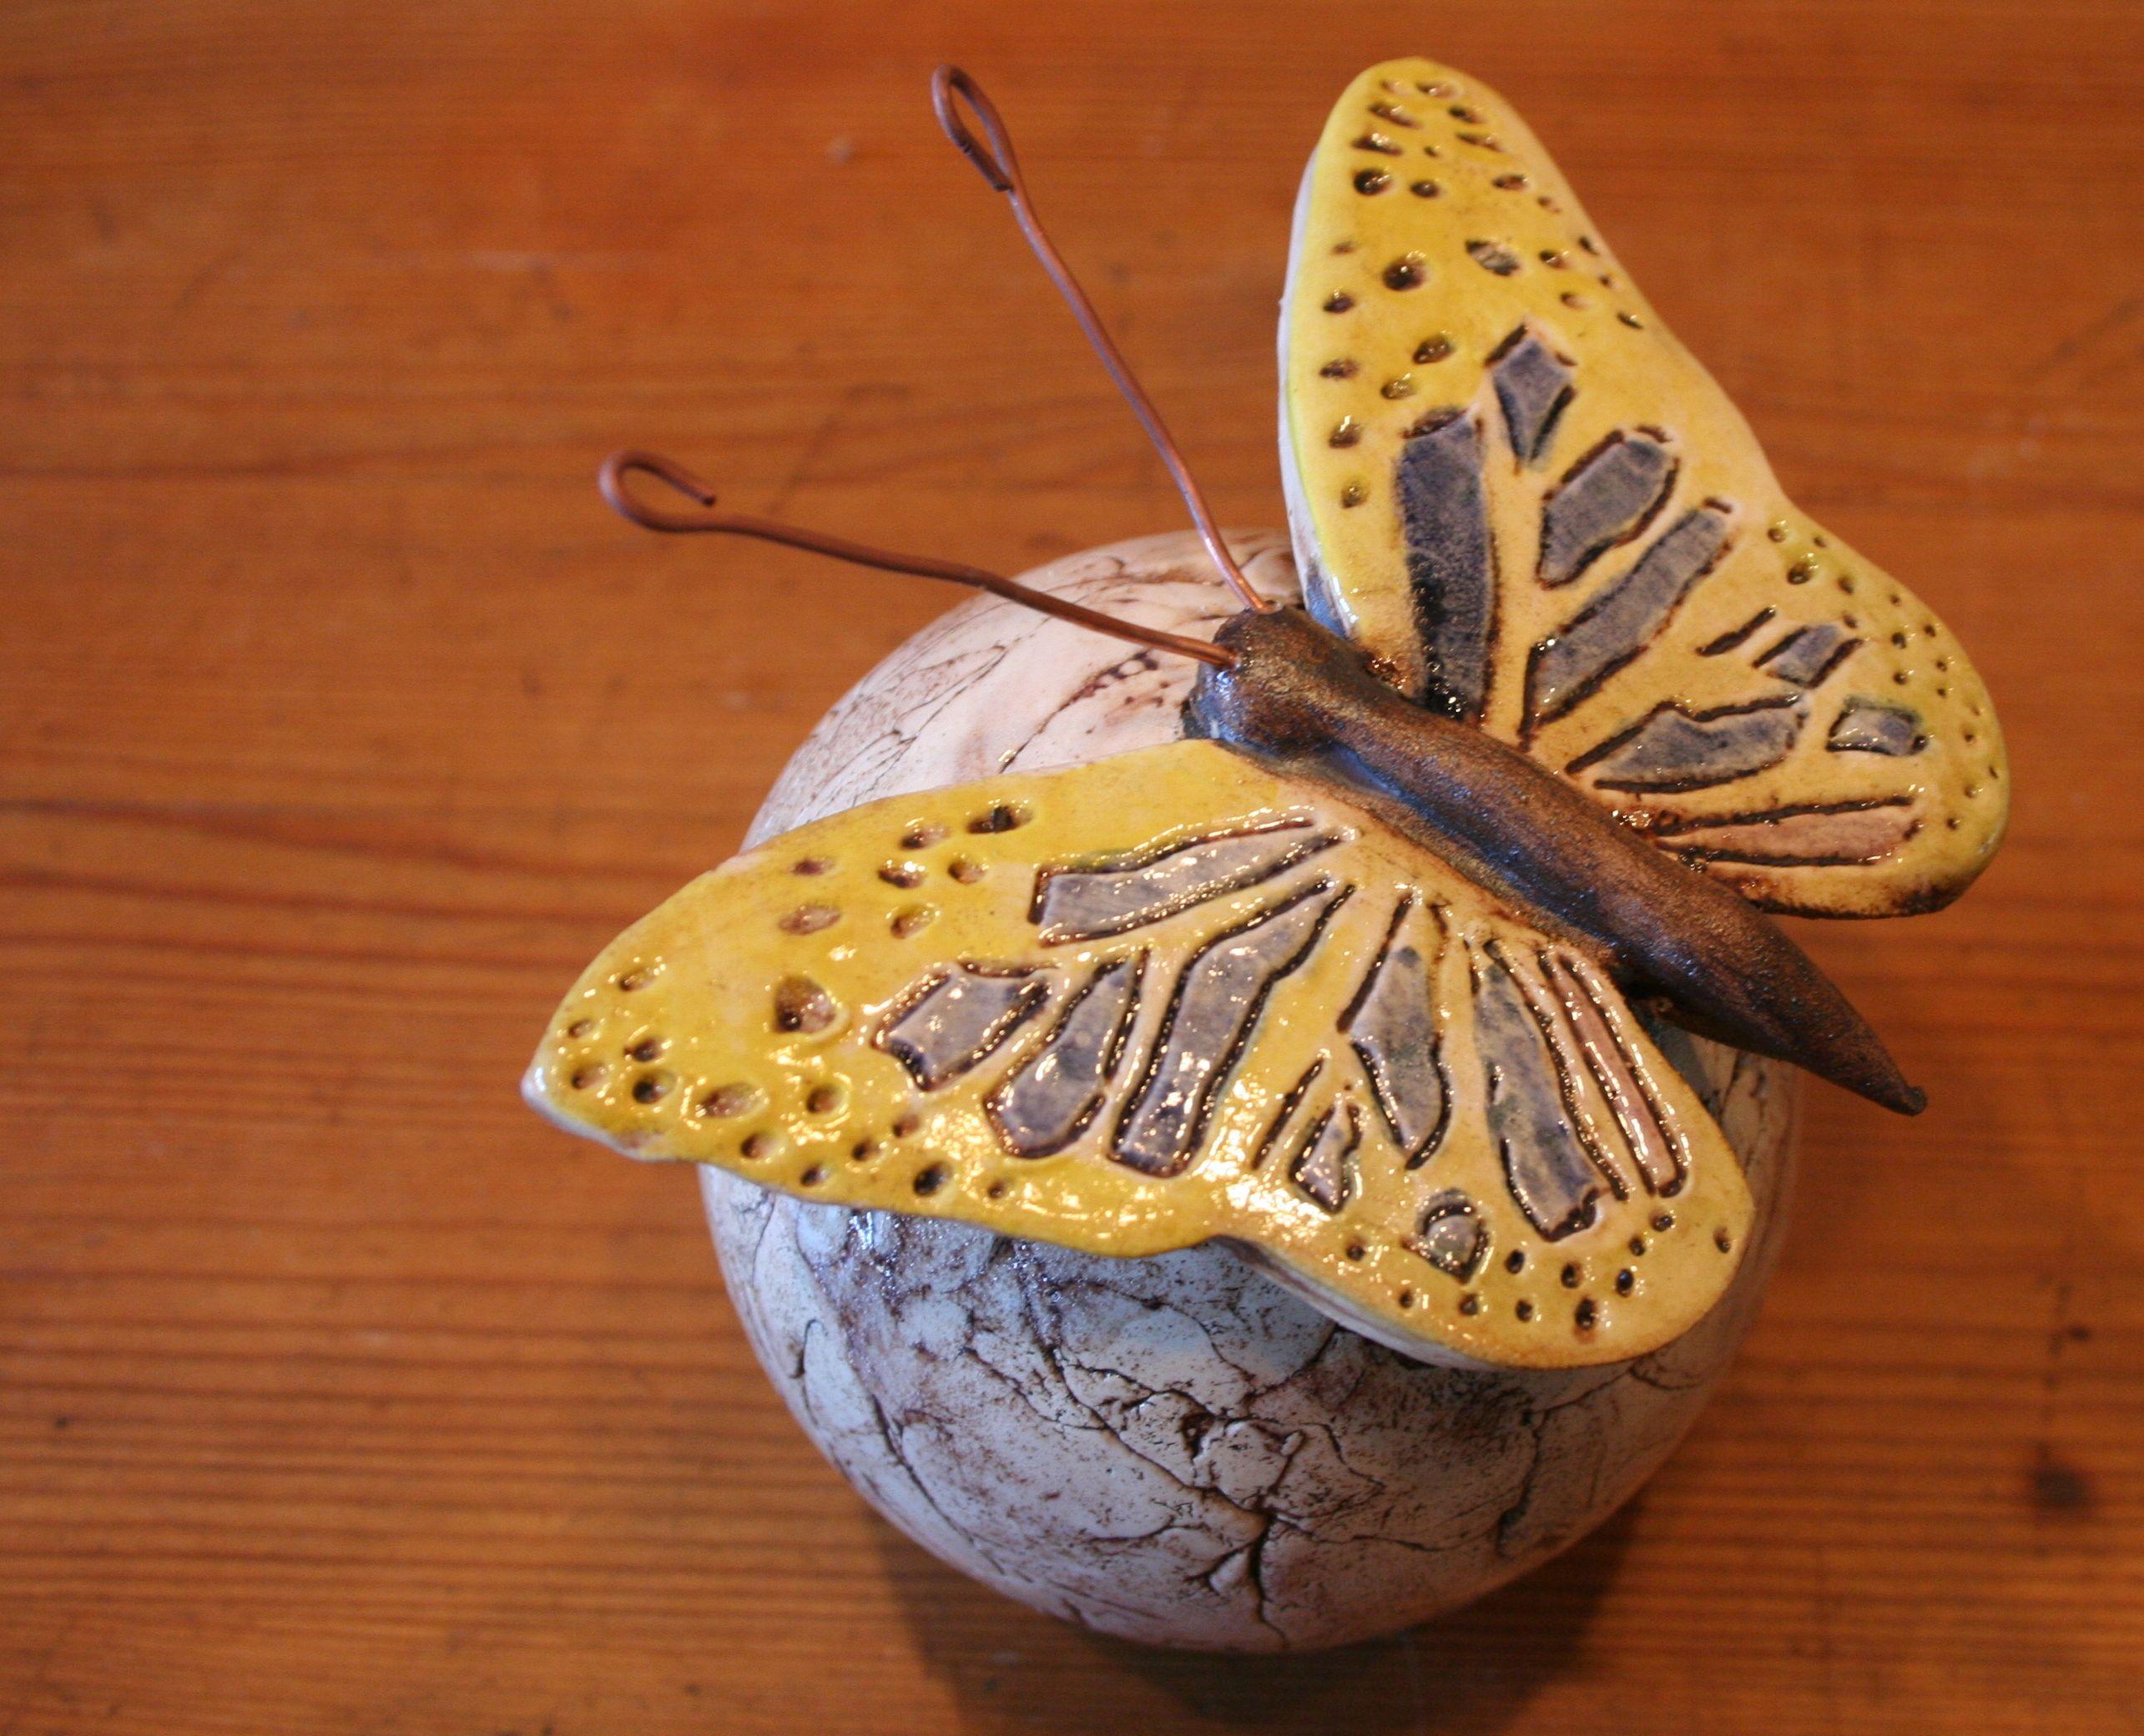 Sold rosenkugel mit schmetterling keramik porzellan ton deko t pferei wertvolle tipps in - Keramik ideen ...